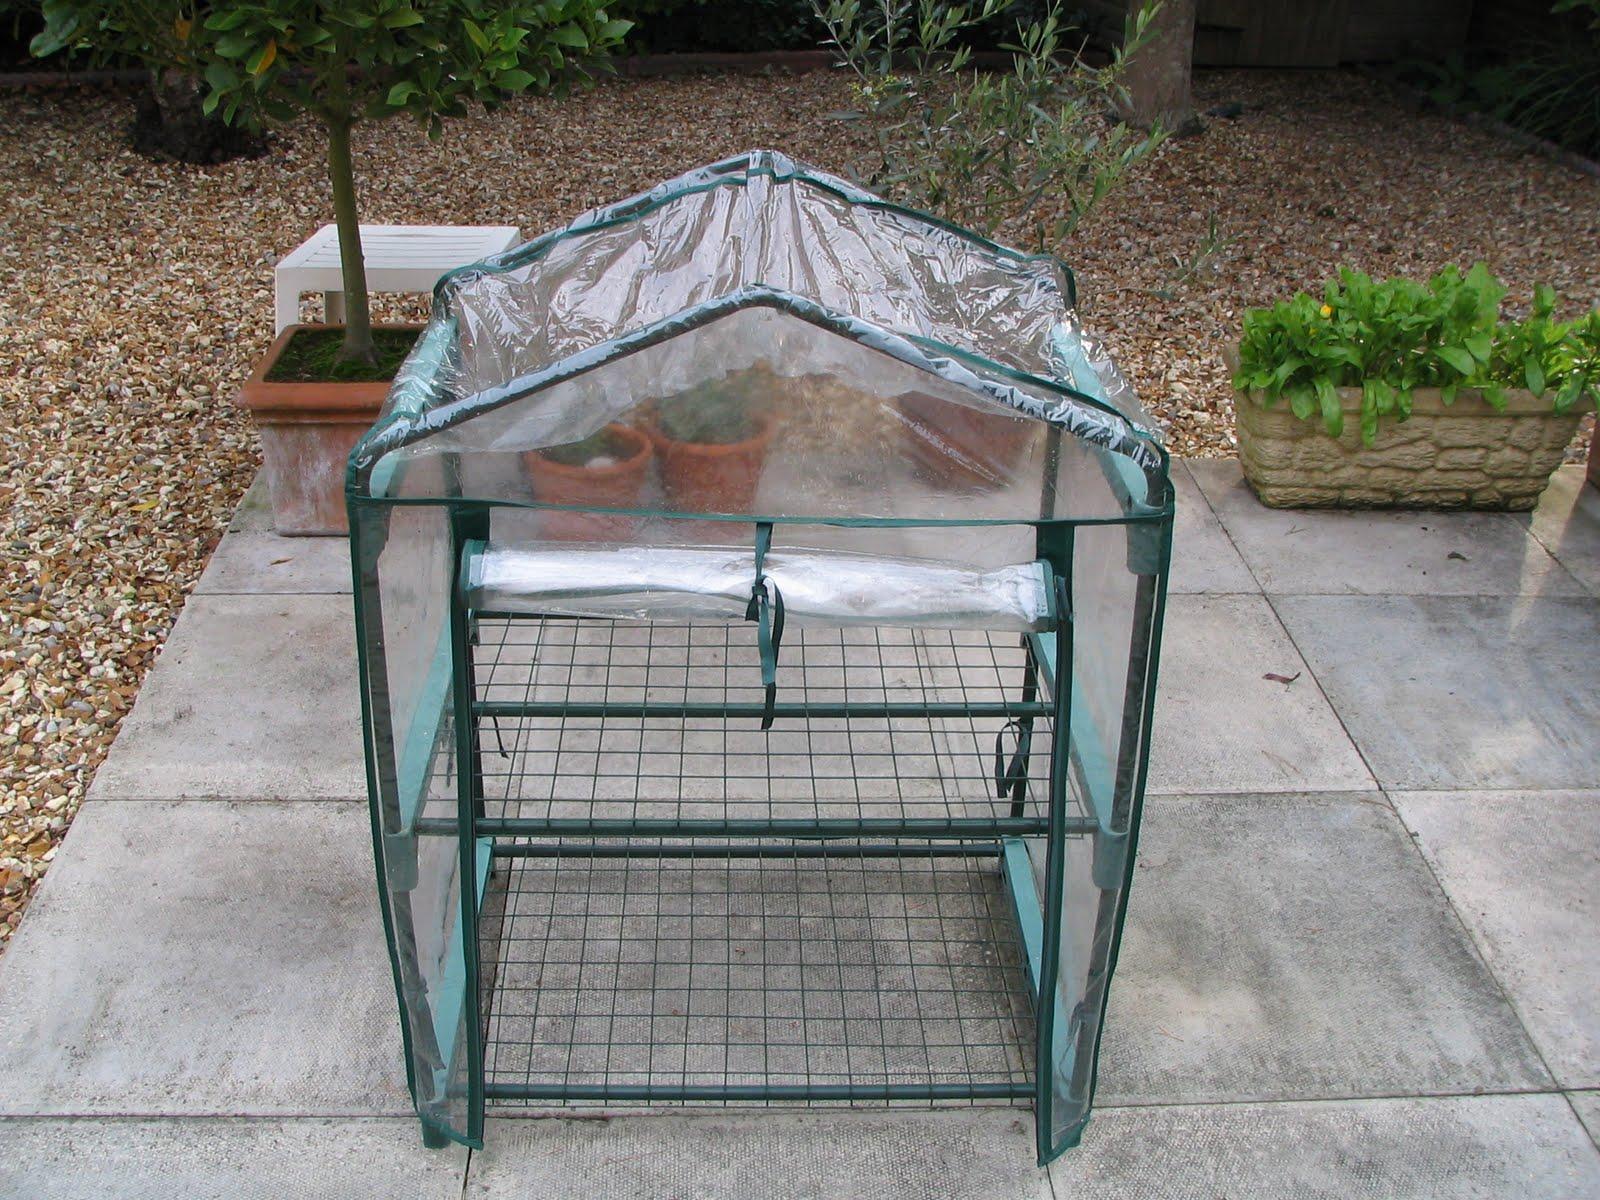 mark 39 s veg plot re vamping the mini greenhouses. Black Bedroom Furniture Sets. Home Design Ideas